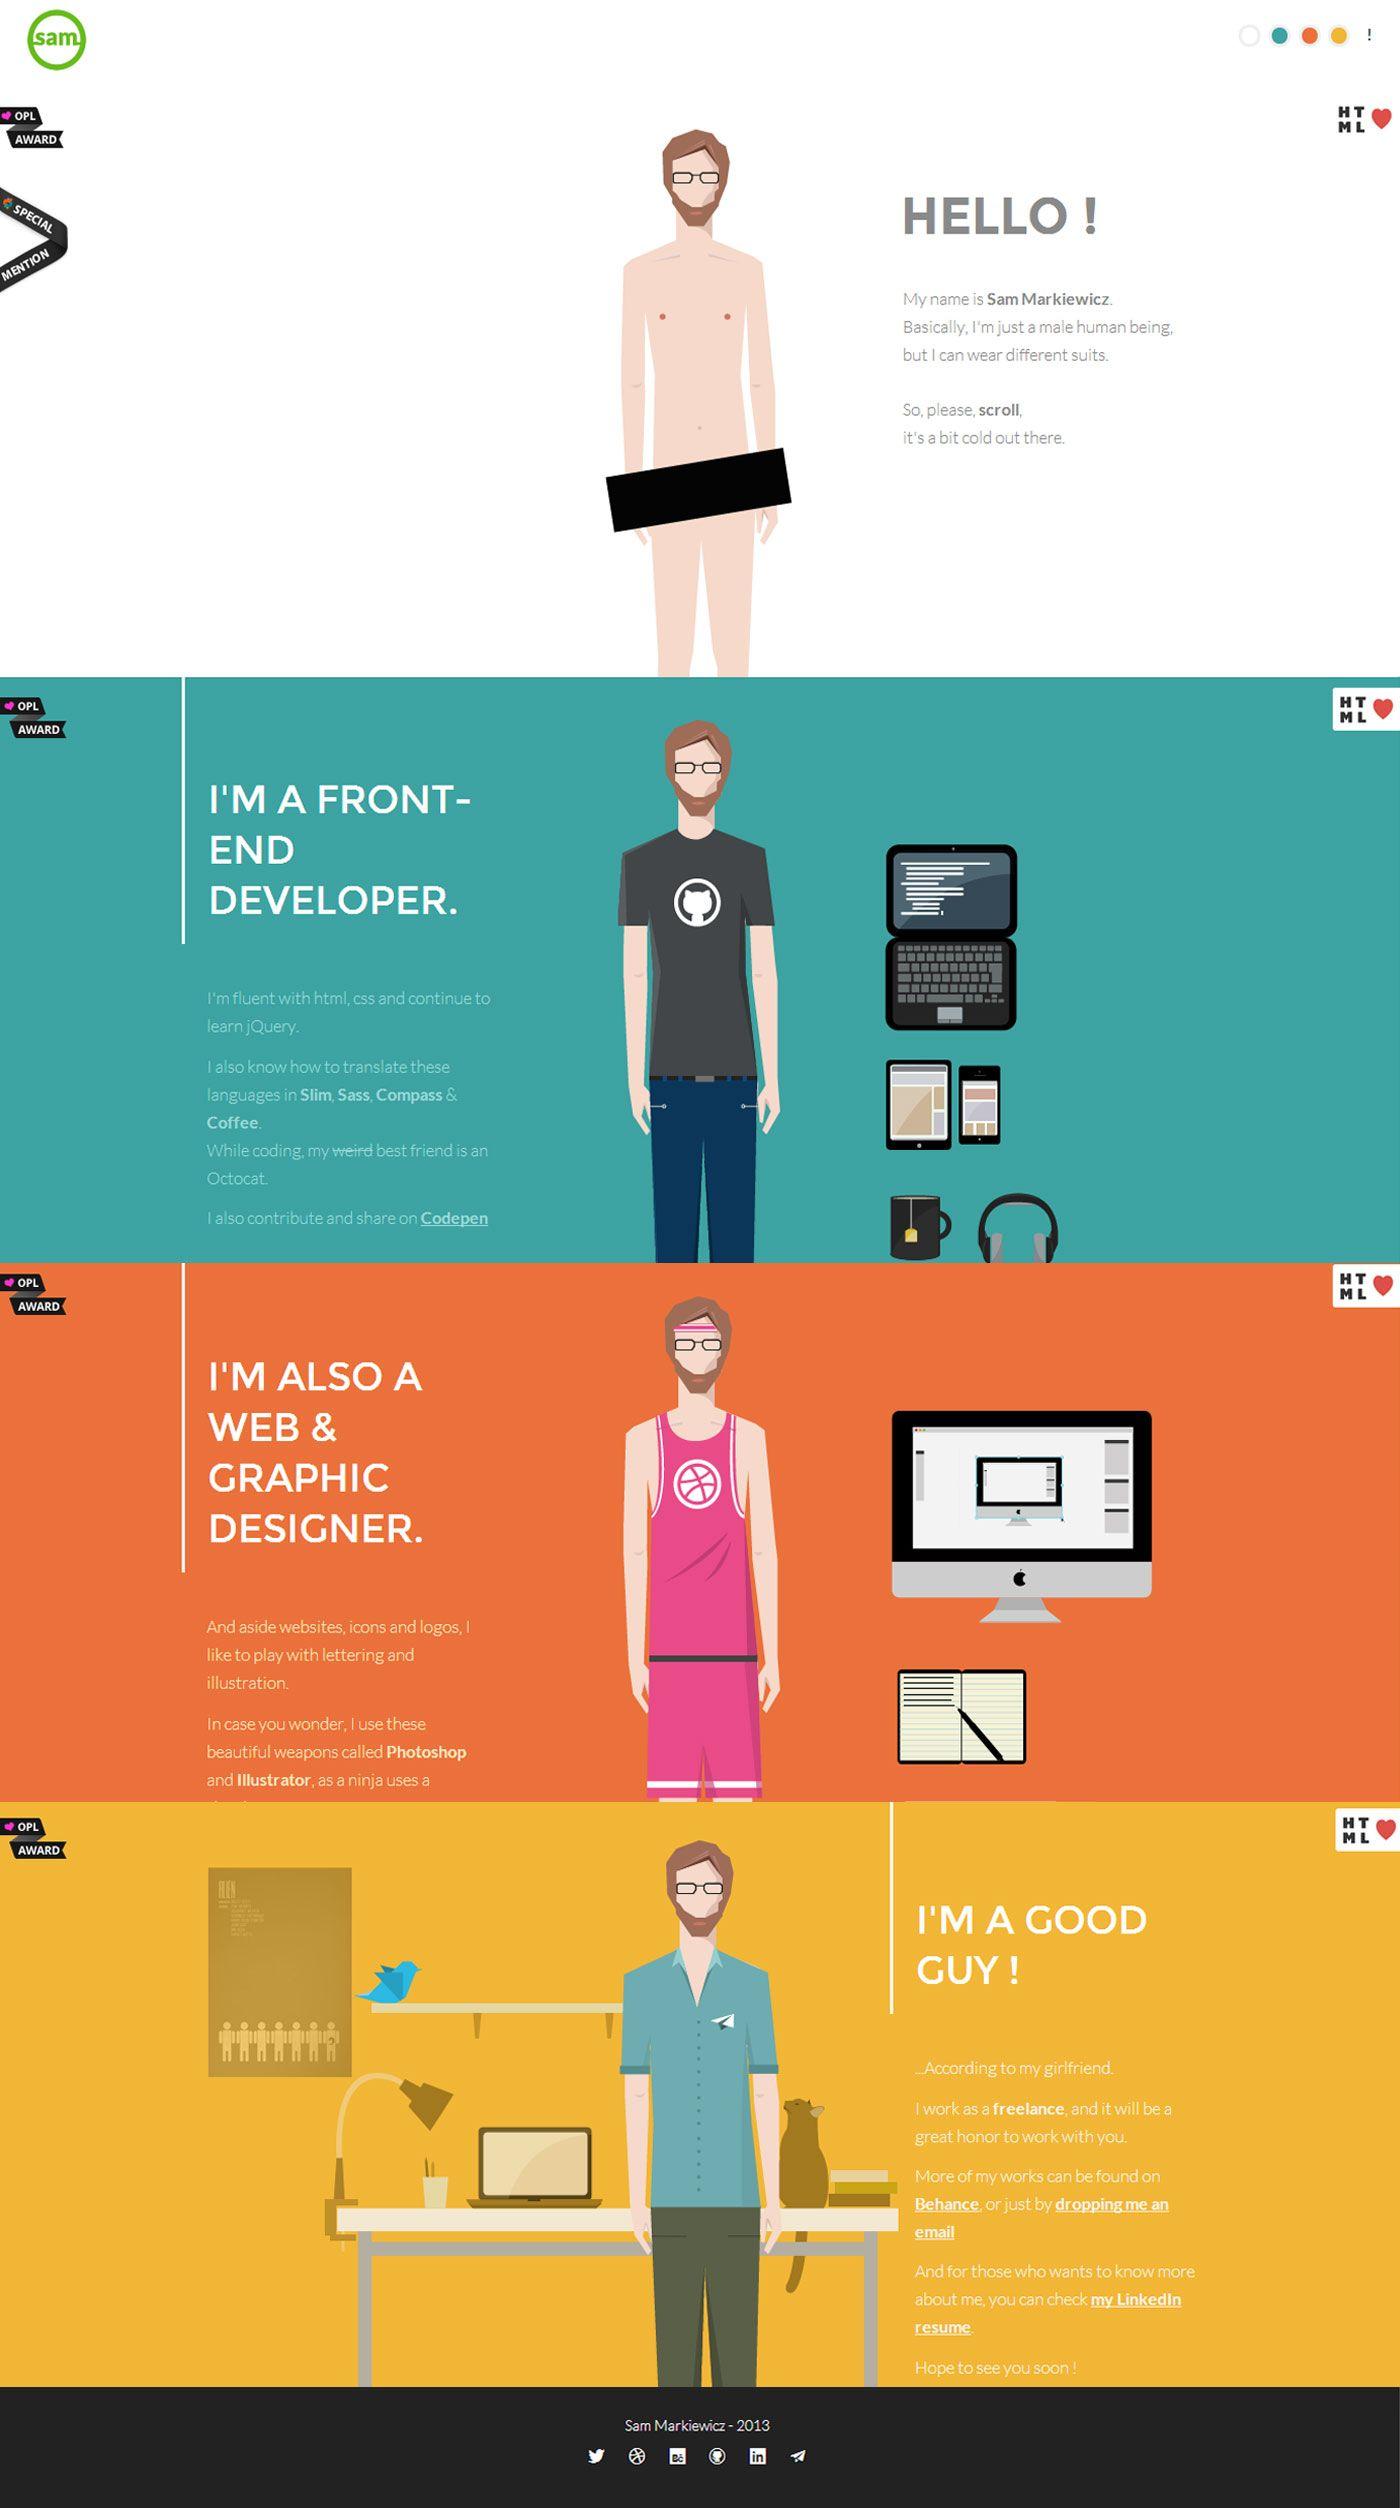 Sam Markiewicz - Flat UI Design Trends